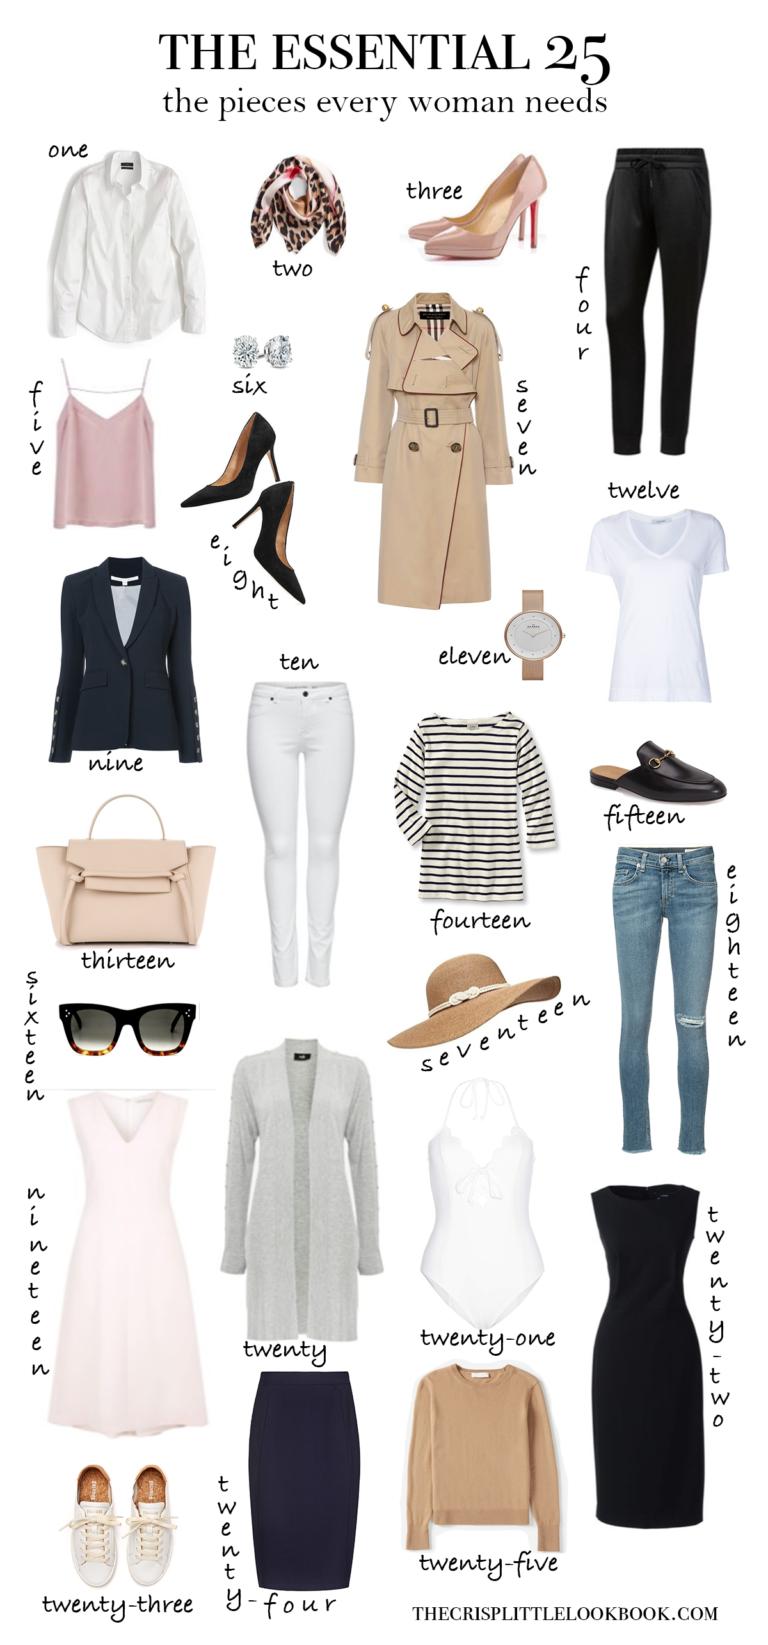 The Essential 25 The Crisp Little Look Book Fashion Capsule Fashion Capsule Wardrobe